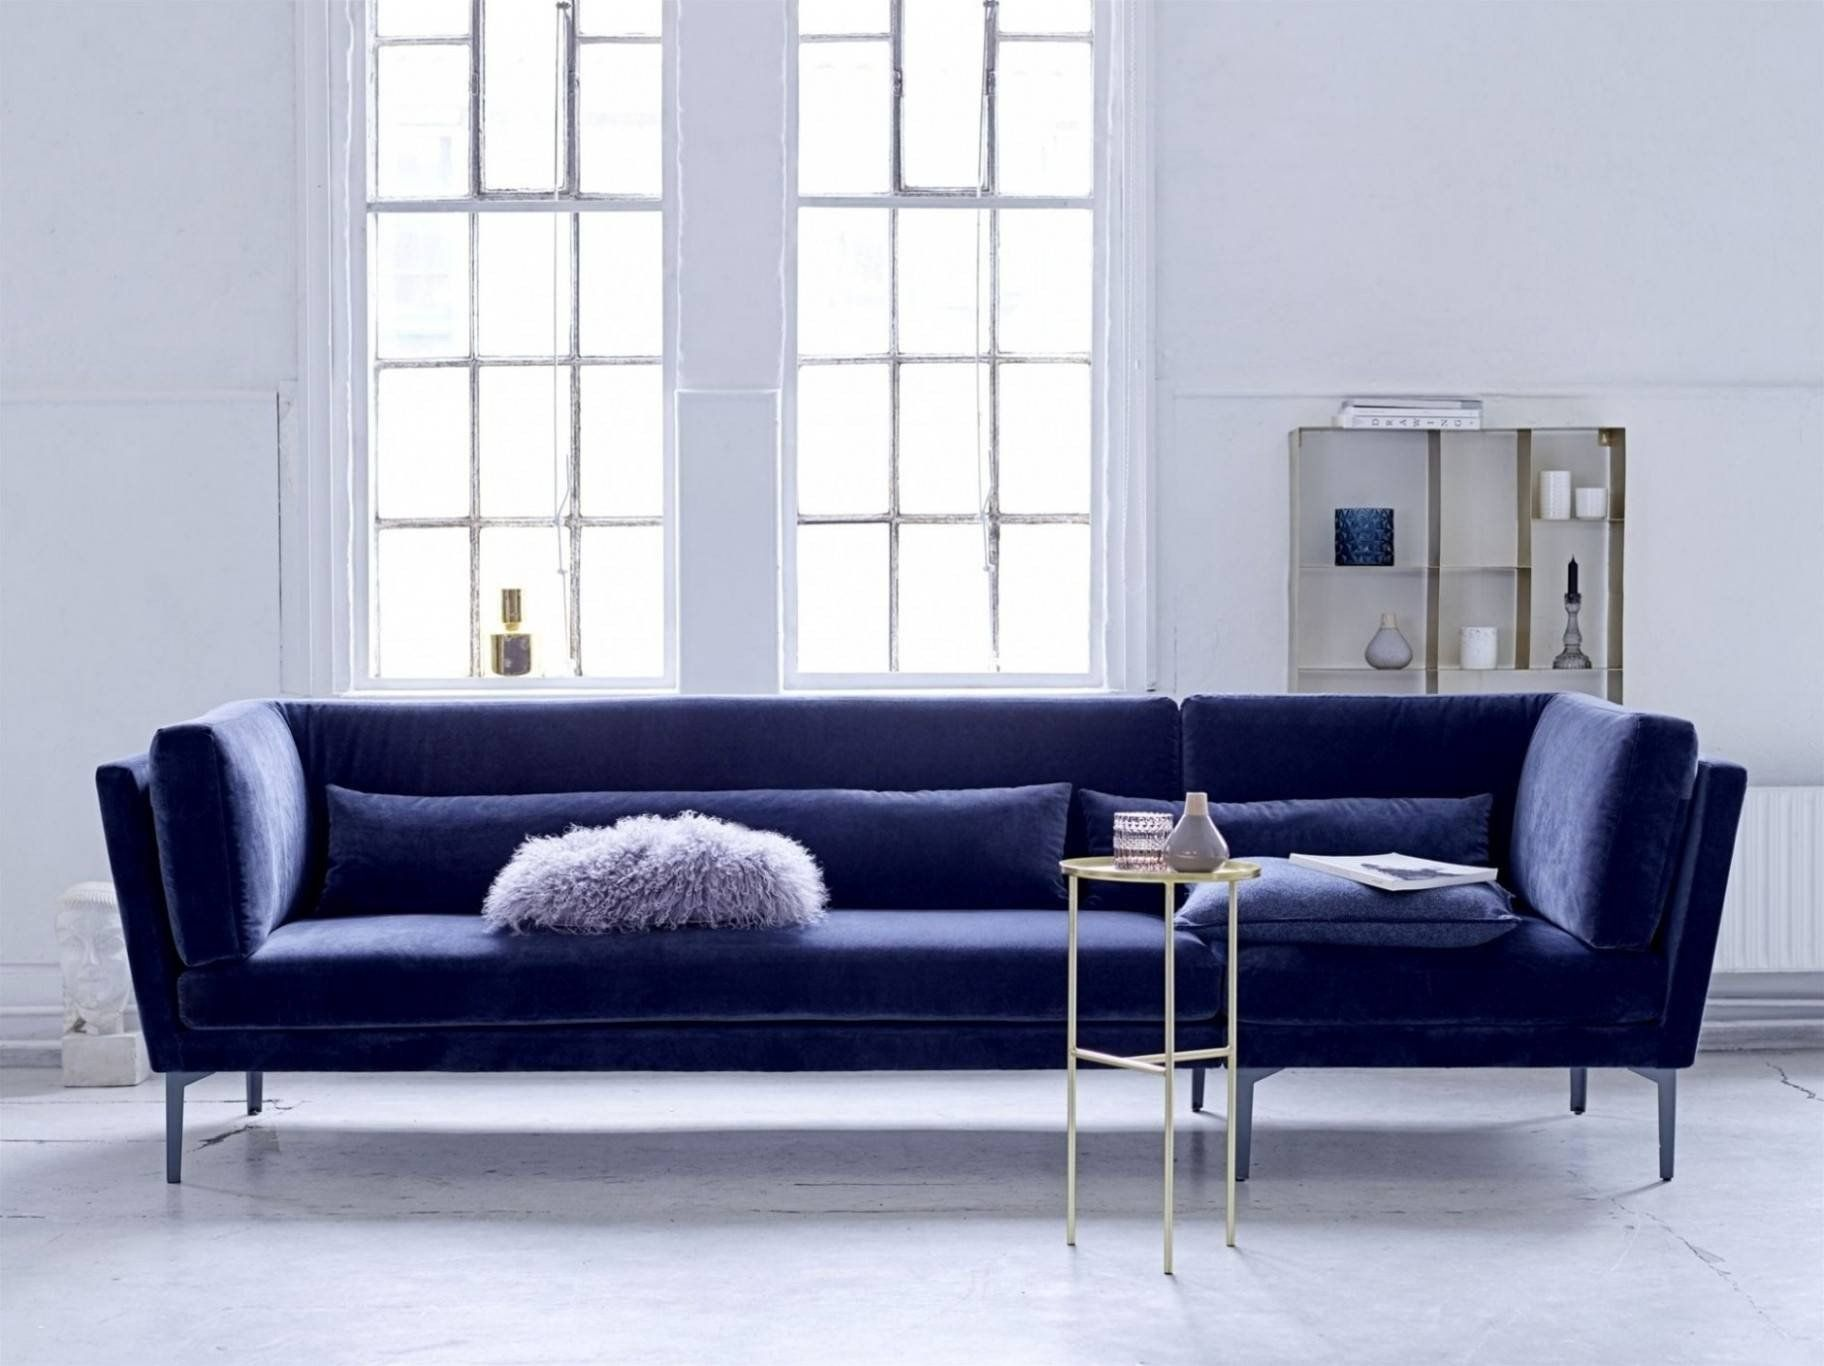 Blue Living Room Ideas Best Of Living Room Inspirational Beautiful Living Rooms Beautif Living Room Sofa Design Yellow Living Room Sofas Blue Couch Living Room